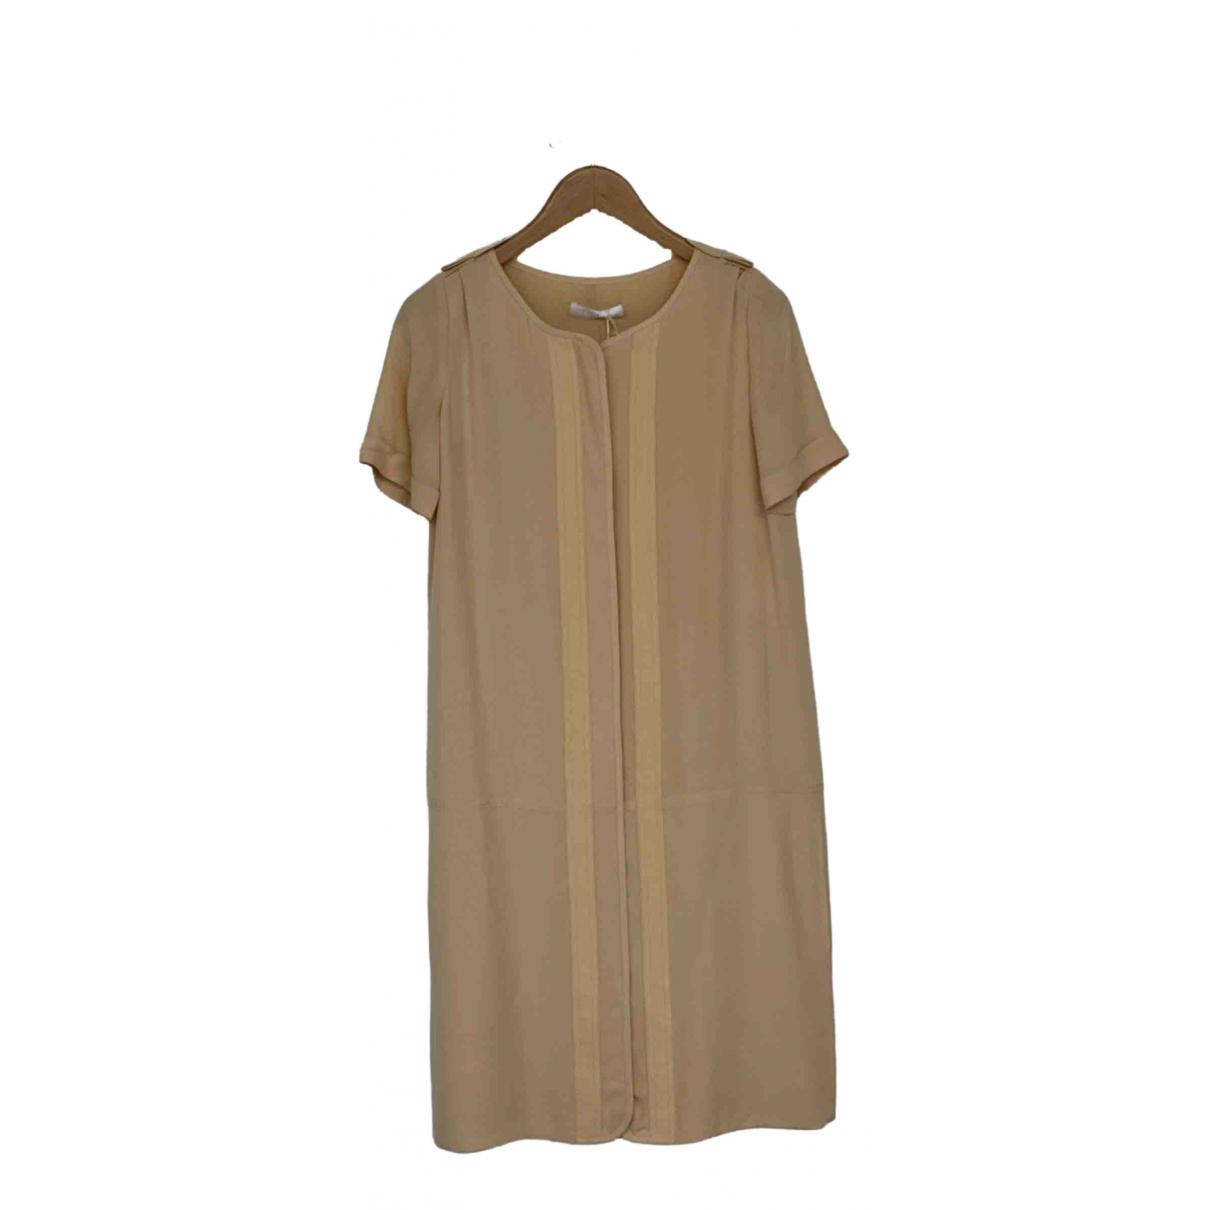 Chloé \N Beige Silk dress for Women 36 FR